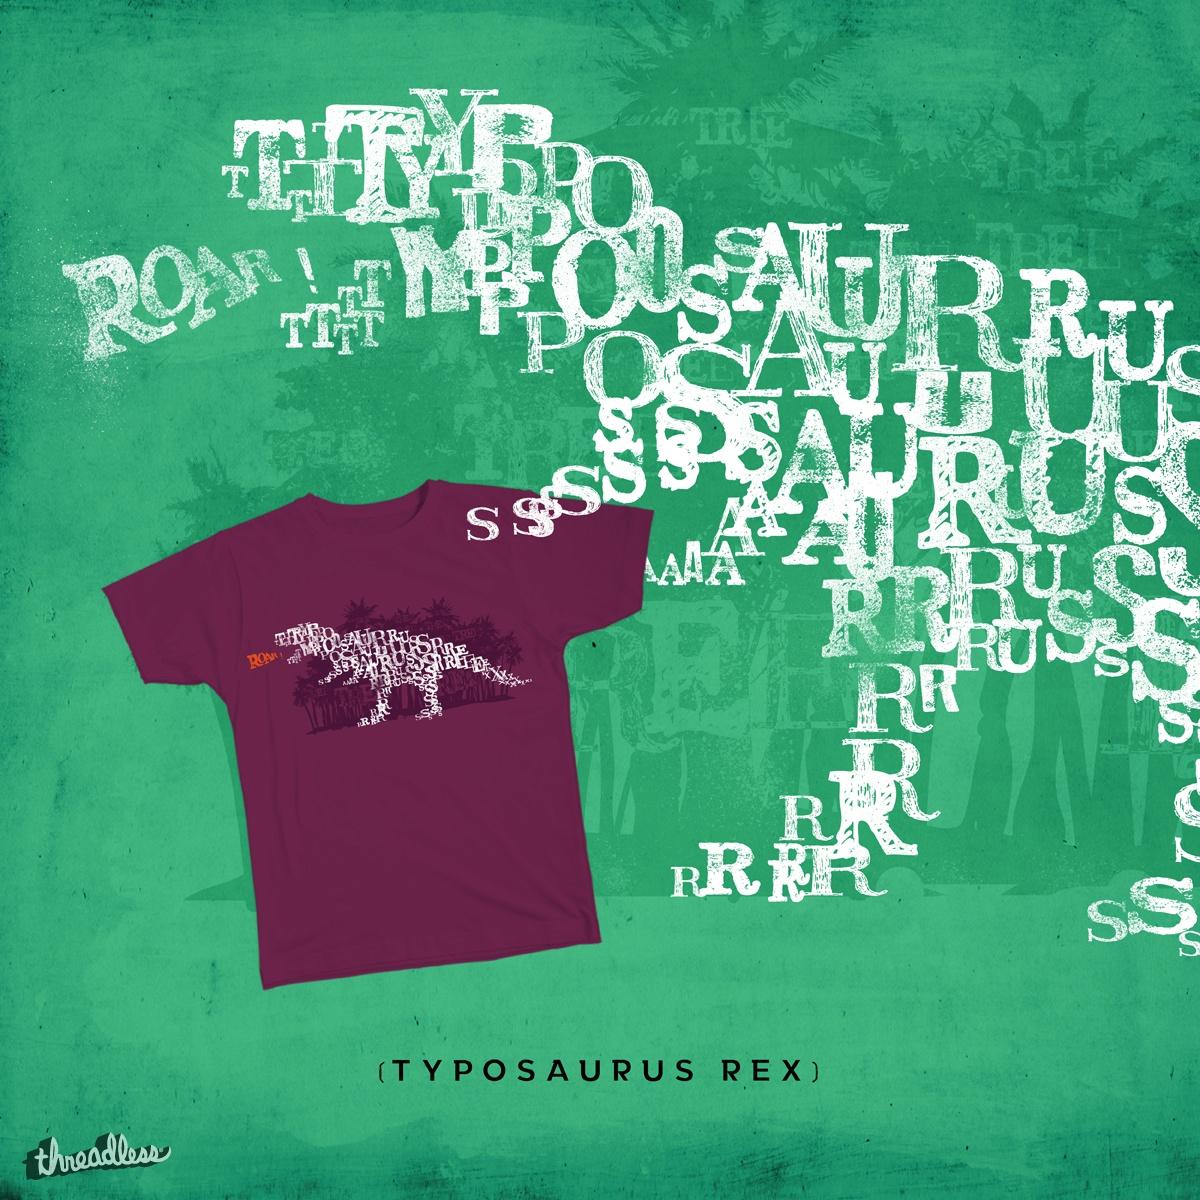 TYPOSAURUS REX by selfish presley on Threadless